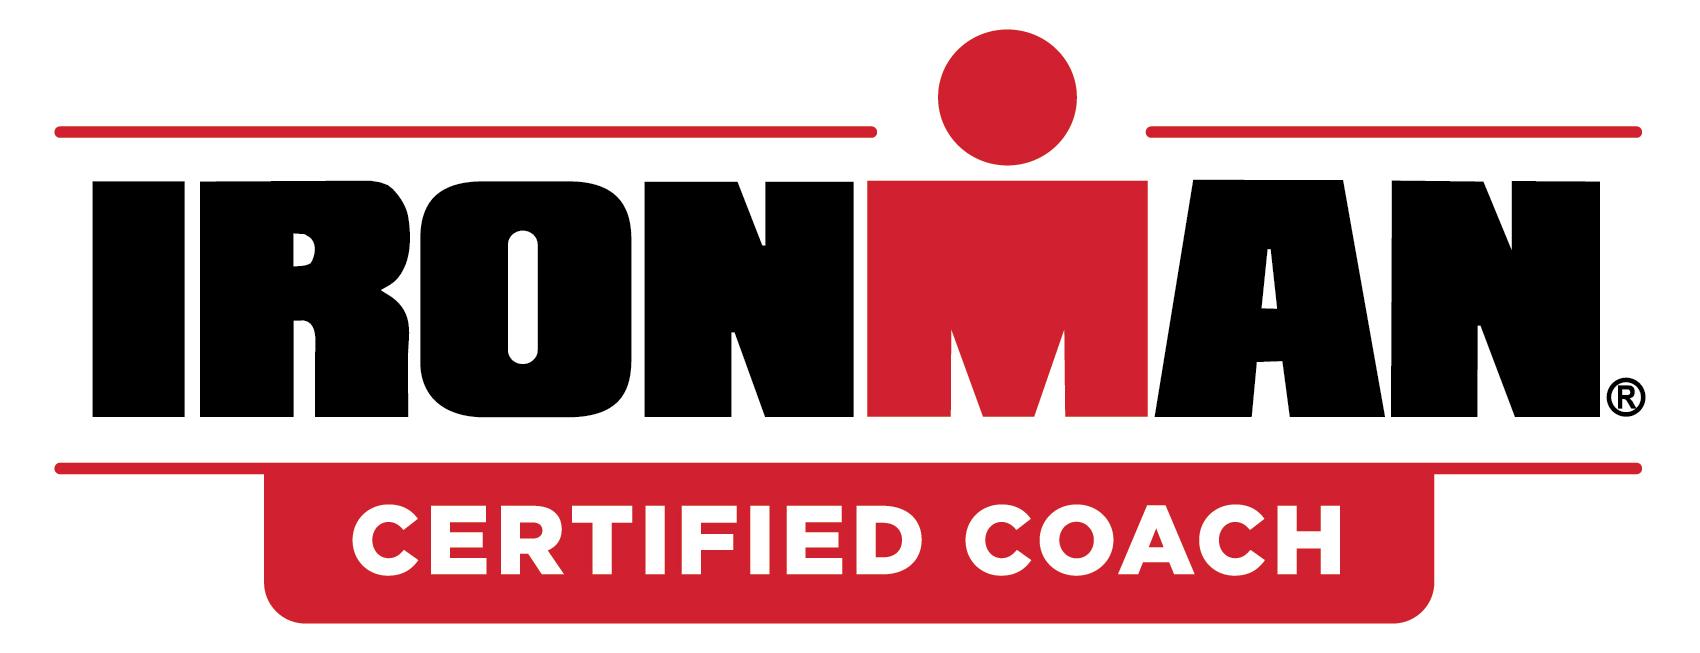 ironman-certified-coach-brian-schwind